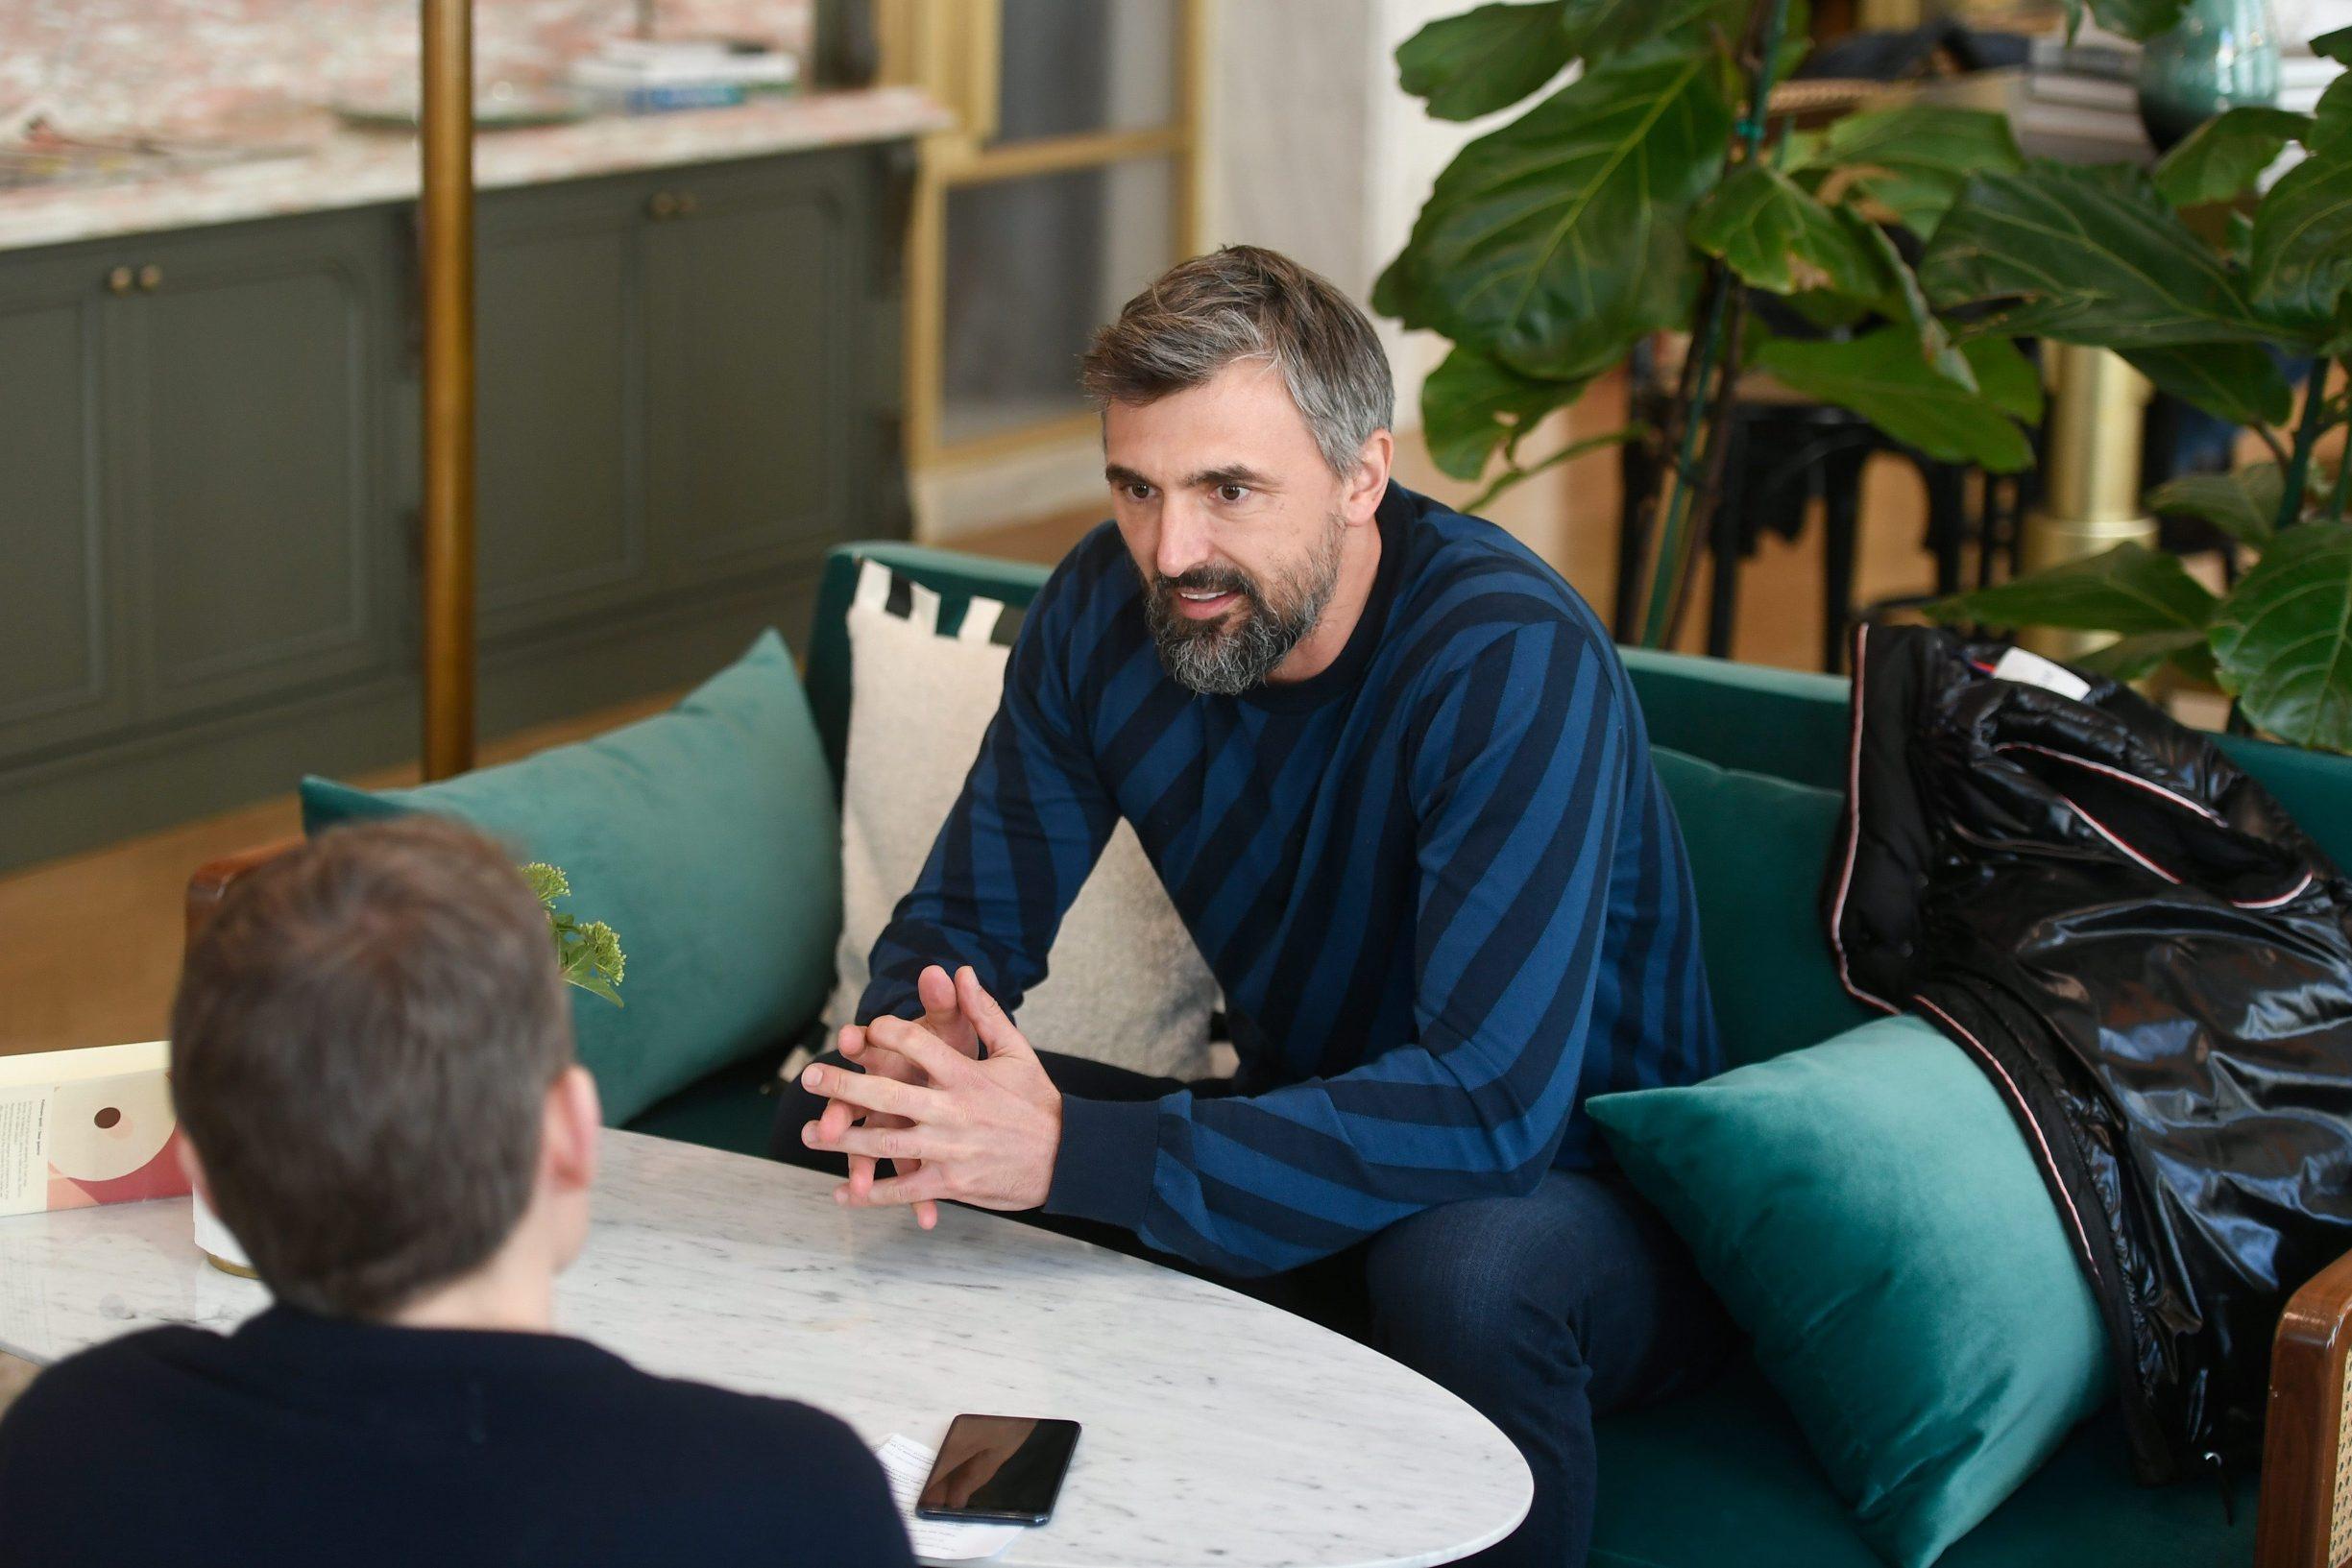 Zagreb, 130220. Jurisiceva. Intervju s Goranom Ivanisevicem. Foto: Goran Mehkek / CROPIX